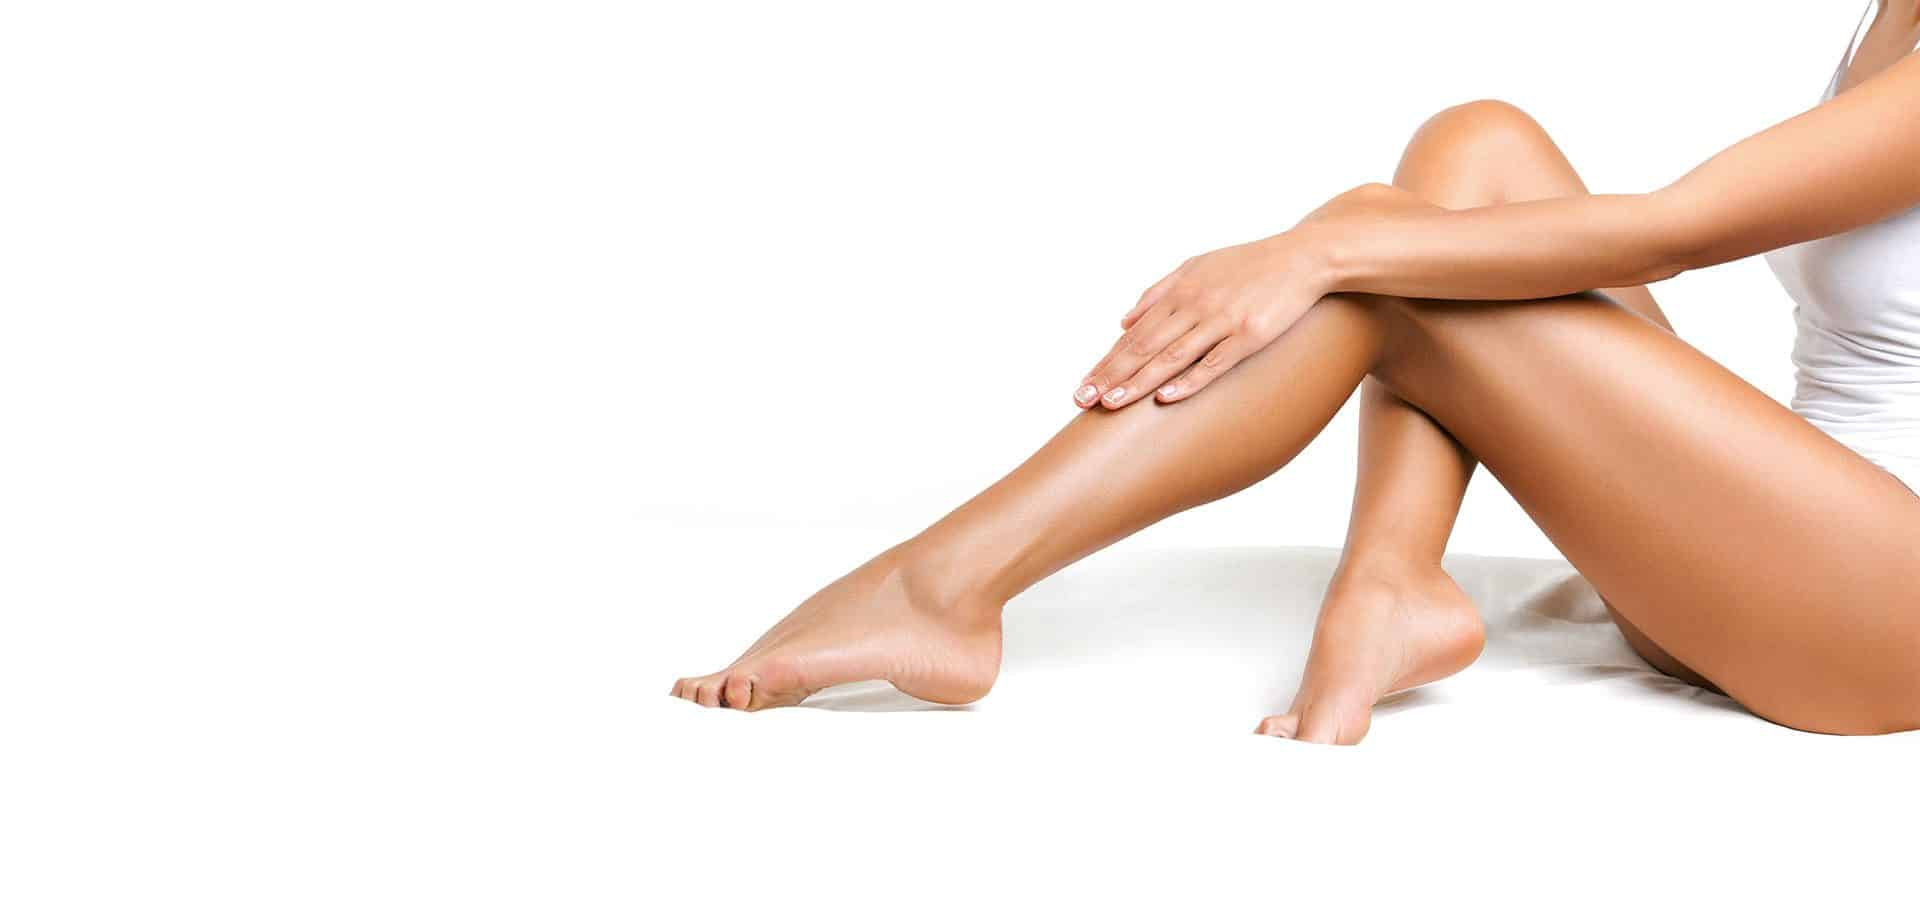 !! Disfruta tus piernas ¡¡